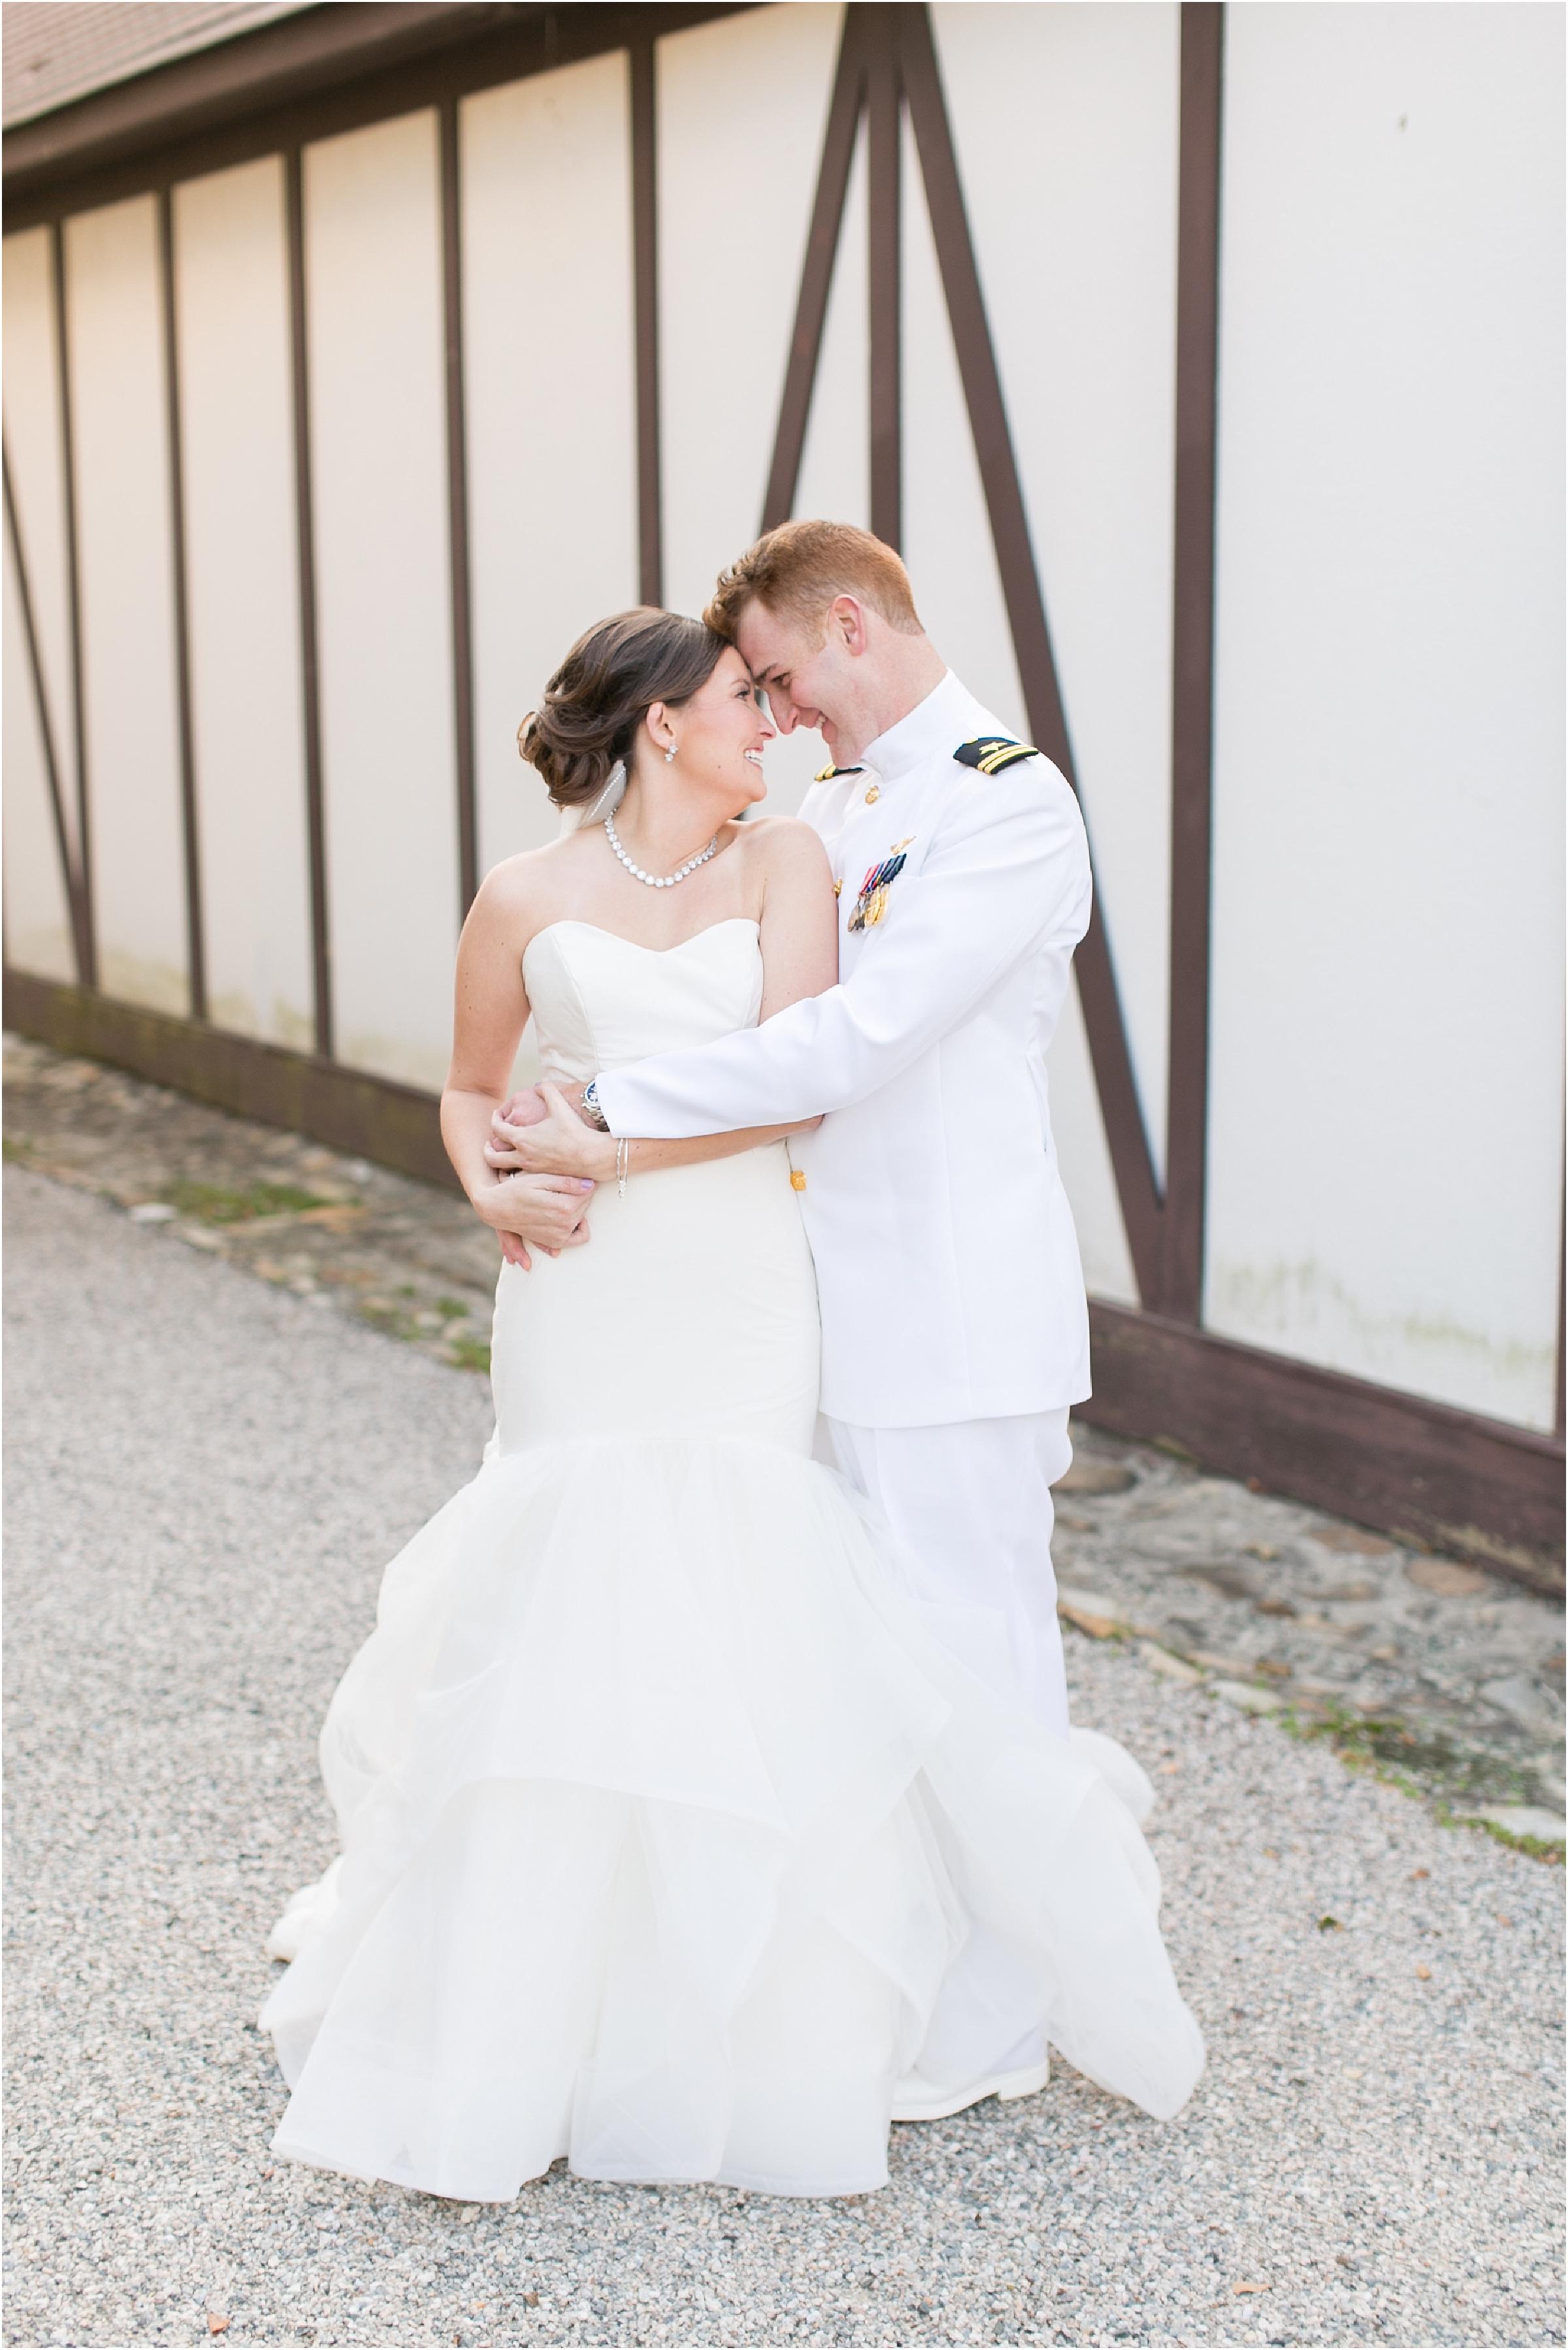 williamsburg winery wedding in williamsburg virginia bride and groom wedding photography